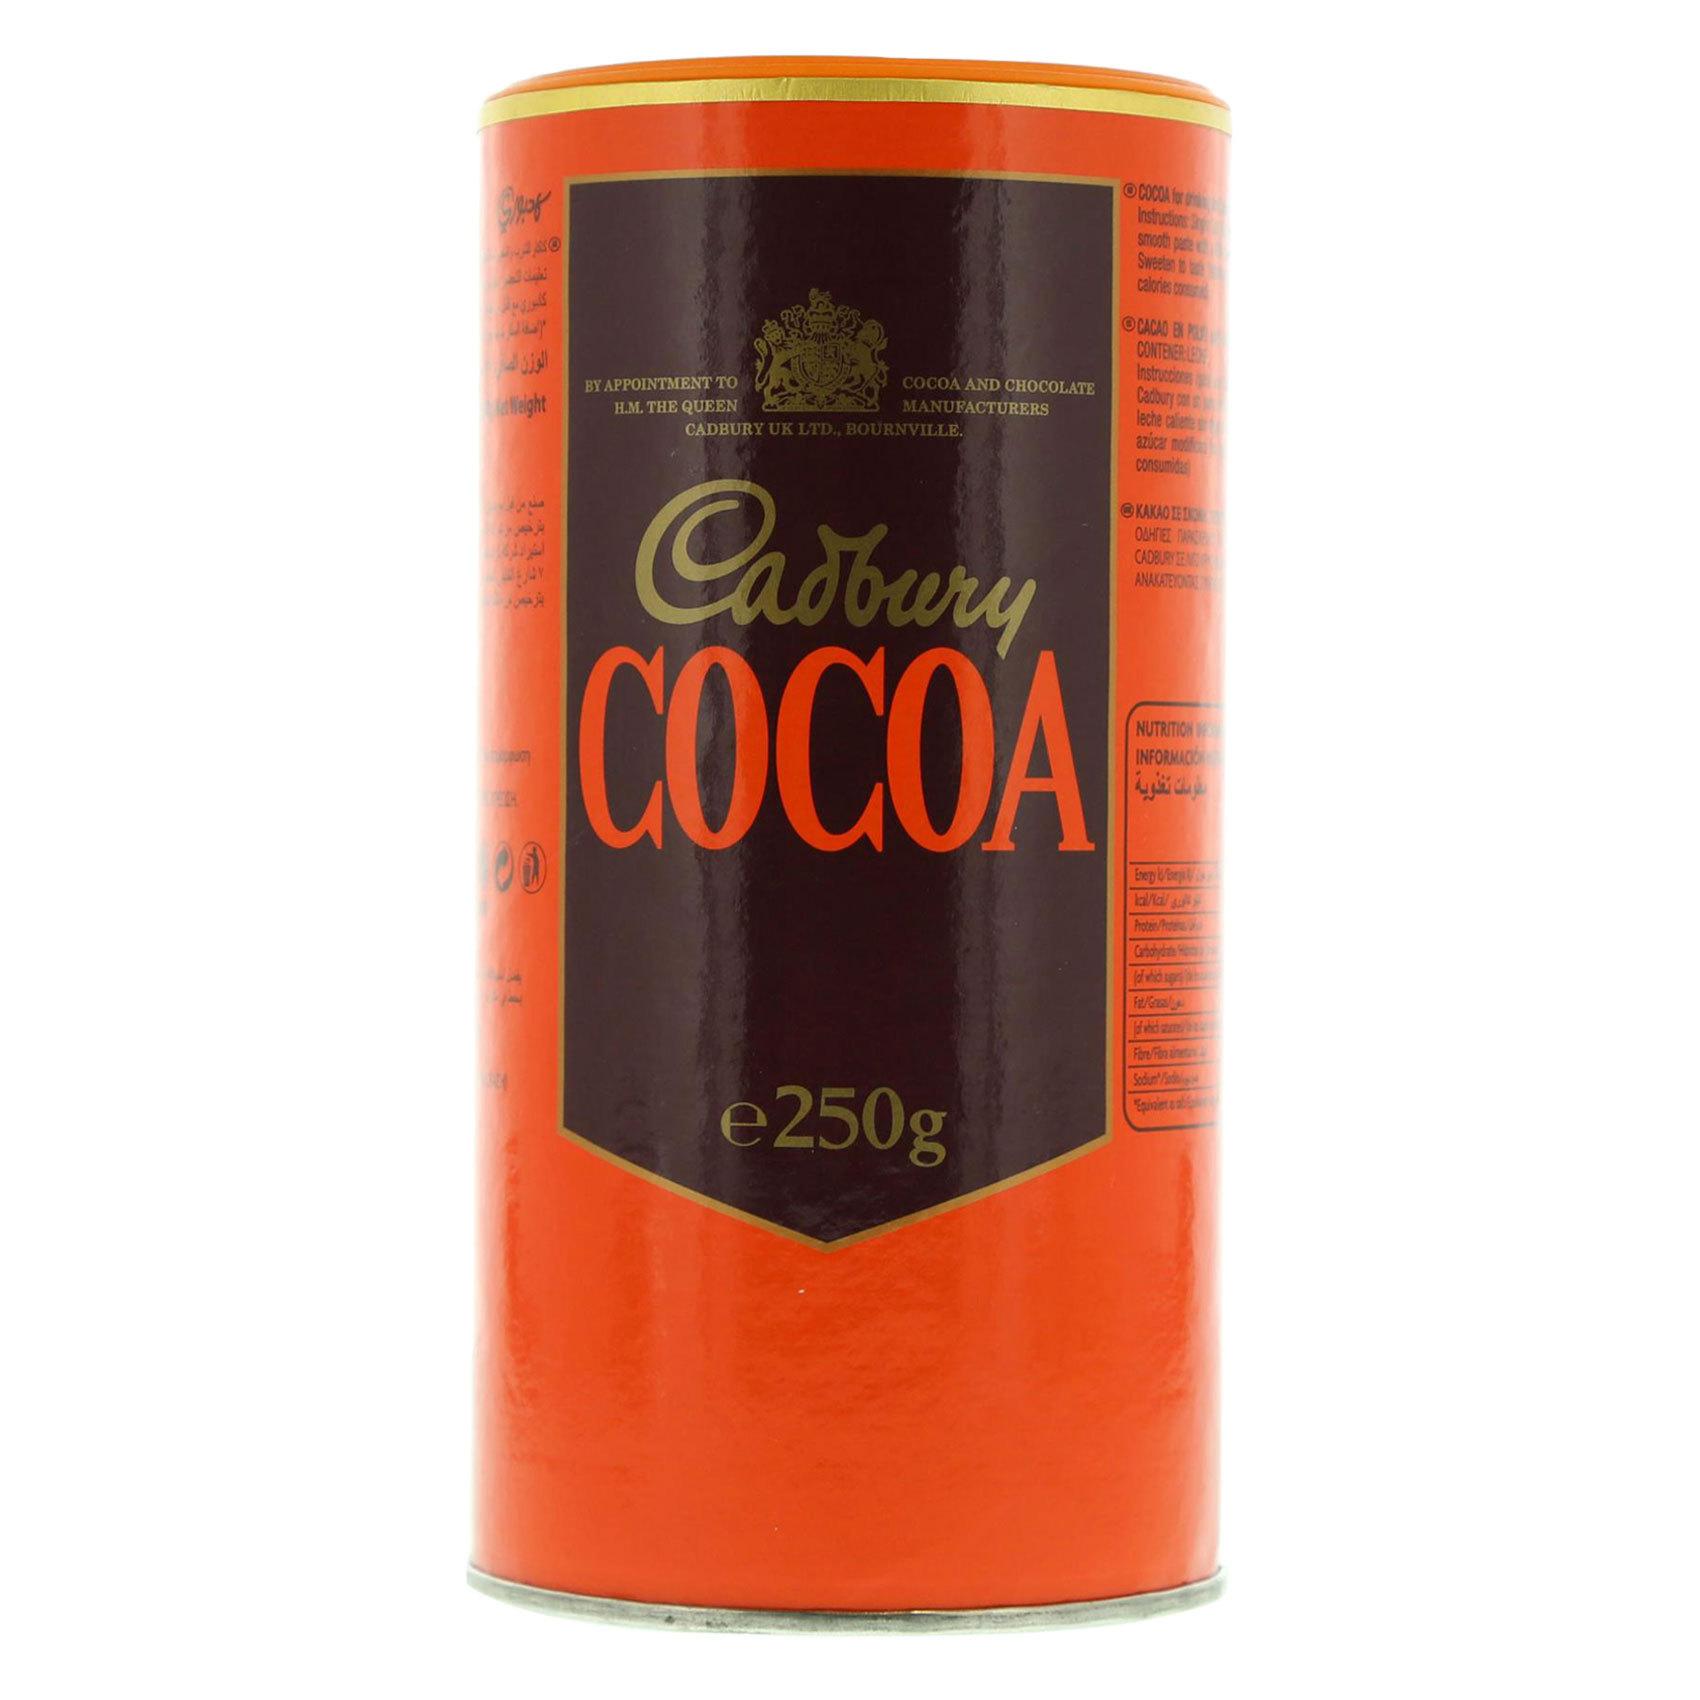 CADBURY COCOA POWDER 250GR